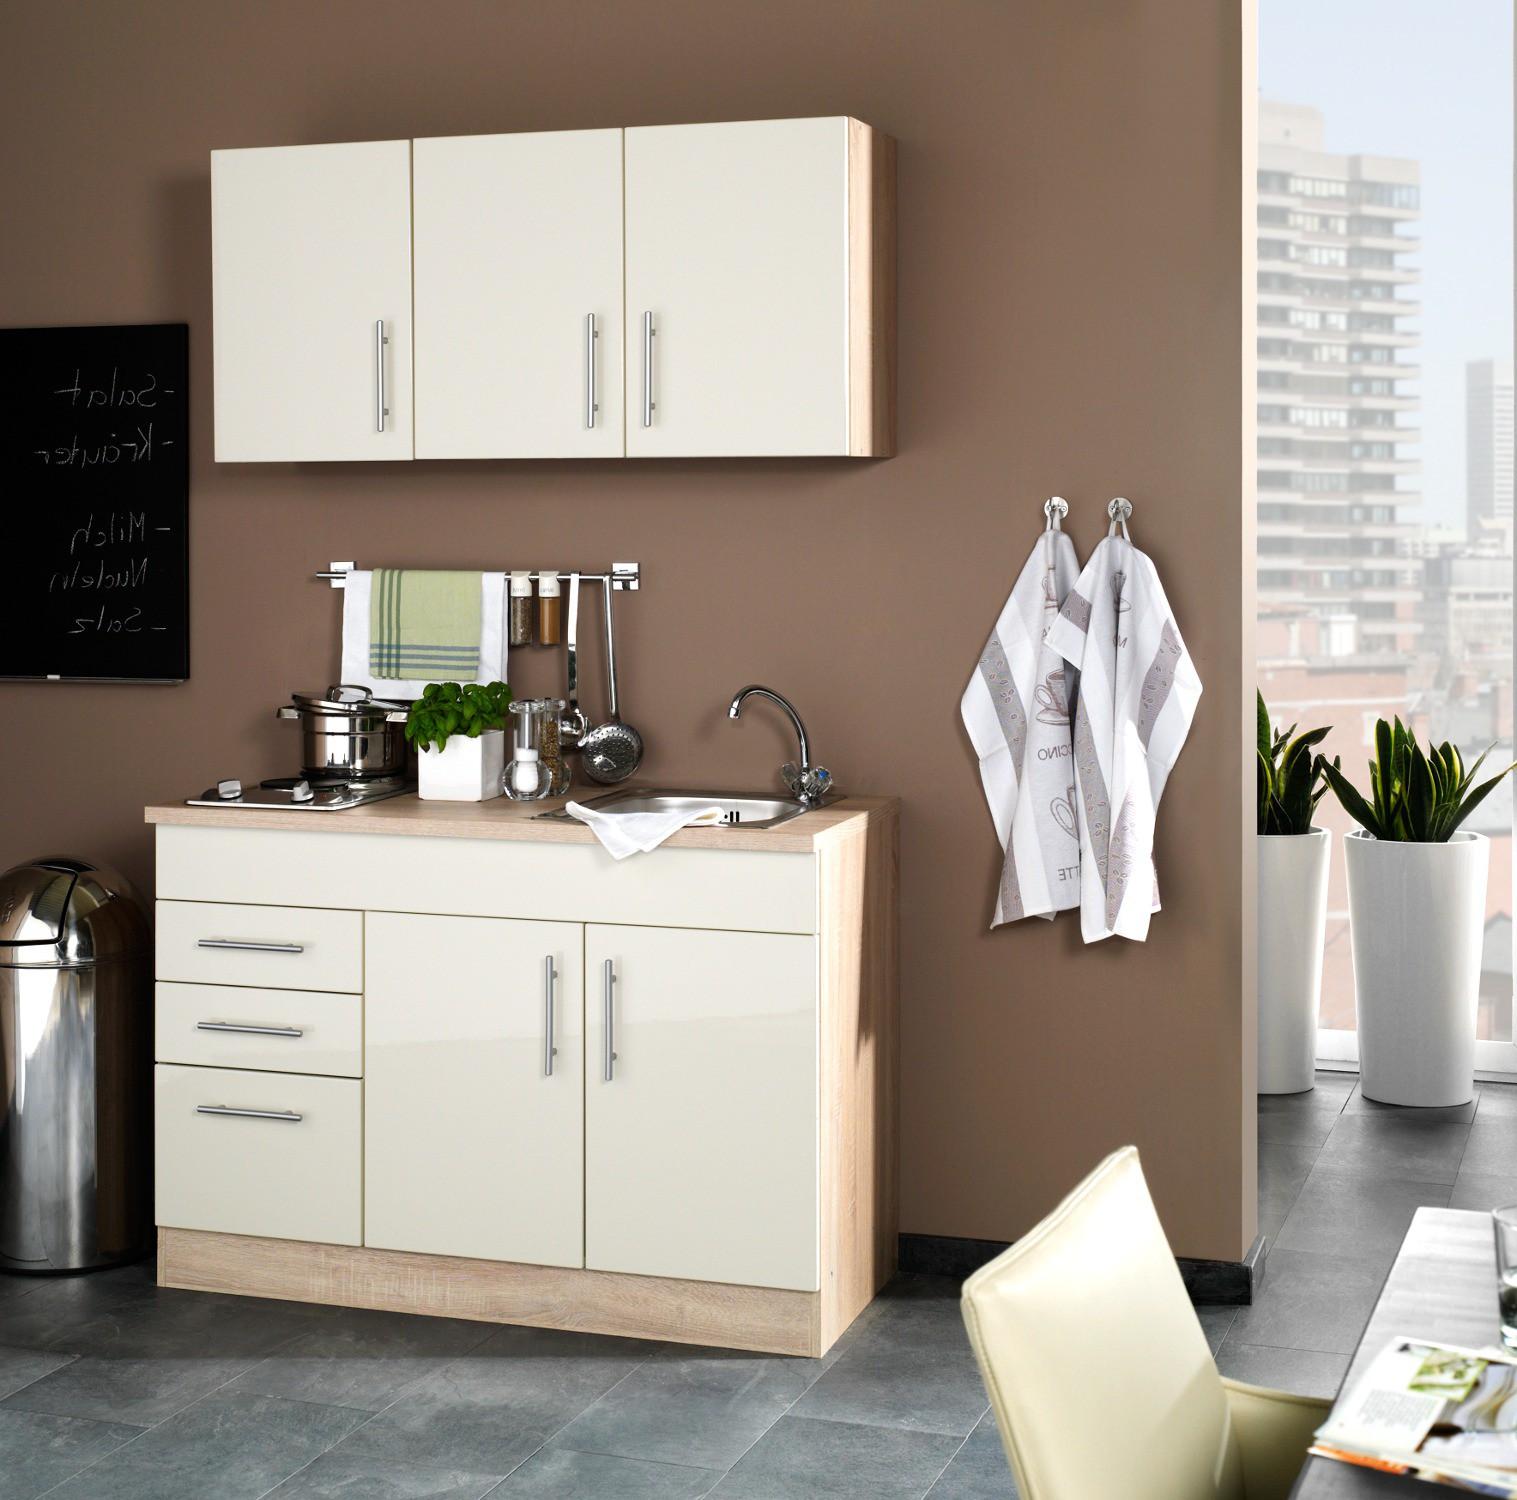 Full Size of Single Küche Mit Backofen Single Küche L Form Single Küche Ohne Elektrogeräte Single Küche Komplett Küche Single Küche